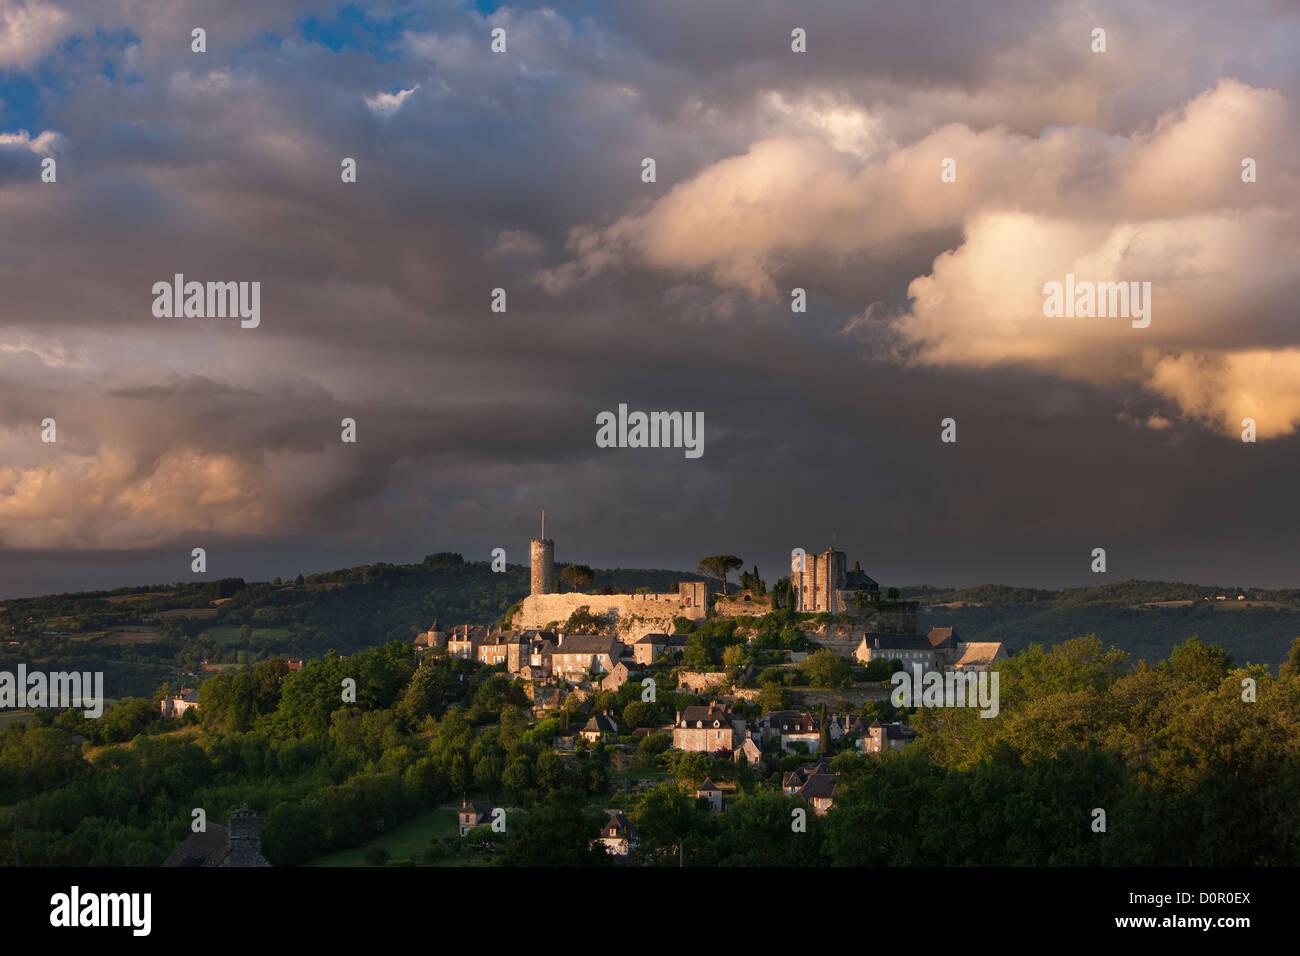 Turenne, Corrèze, Limousin, France - Stock Image